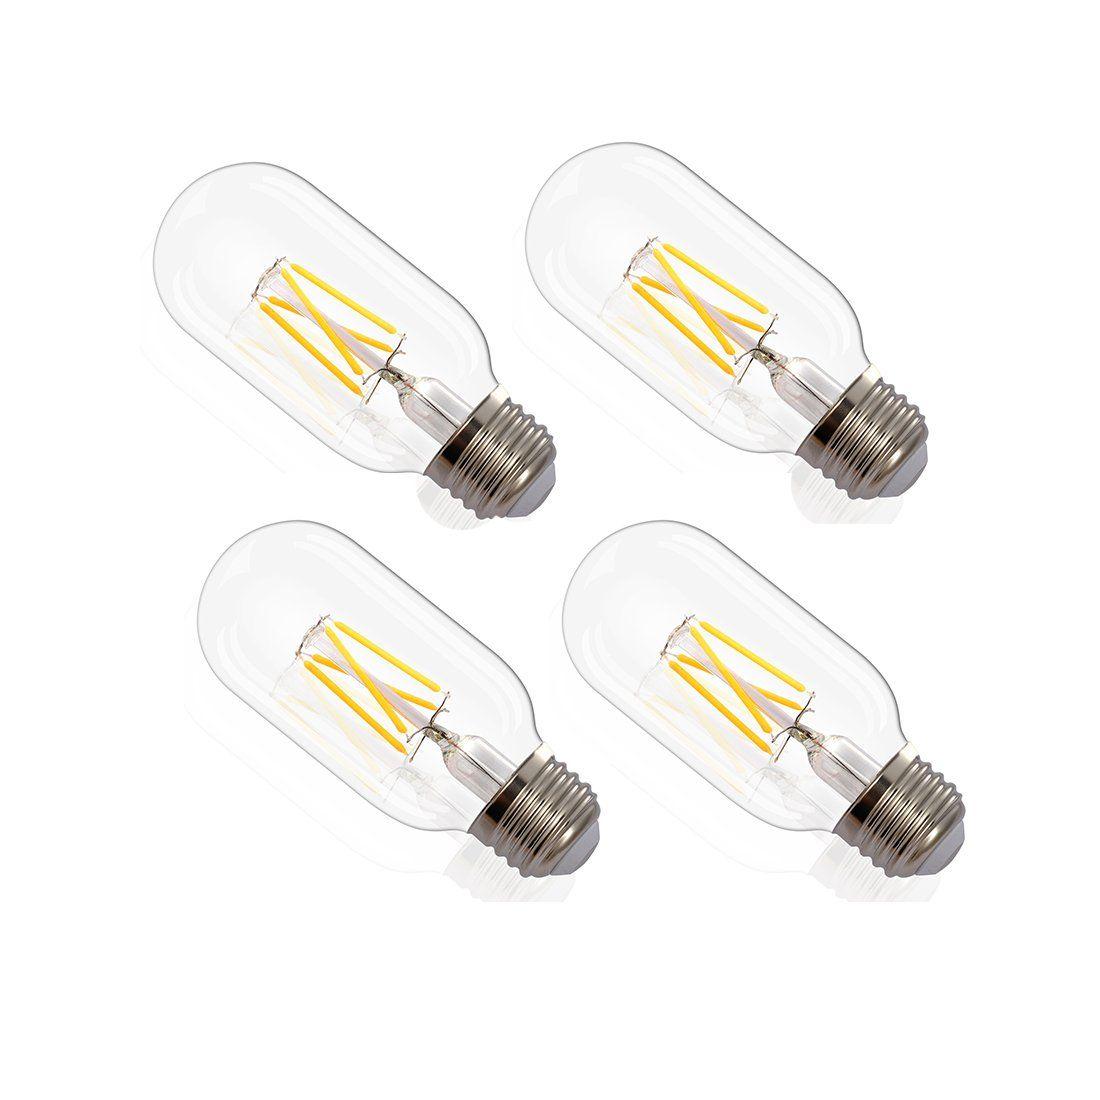 4packs 6w White Light Bulb Edison Highlighted Energy Saving Led Bulb Retro Bubblei œt 45i œelongated Wedding Decoration Light Bulb To